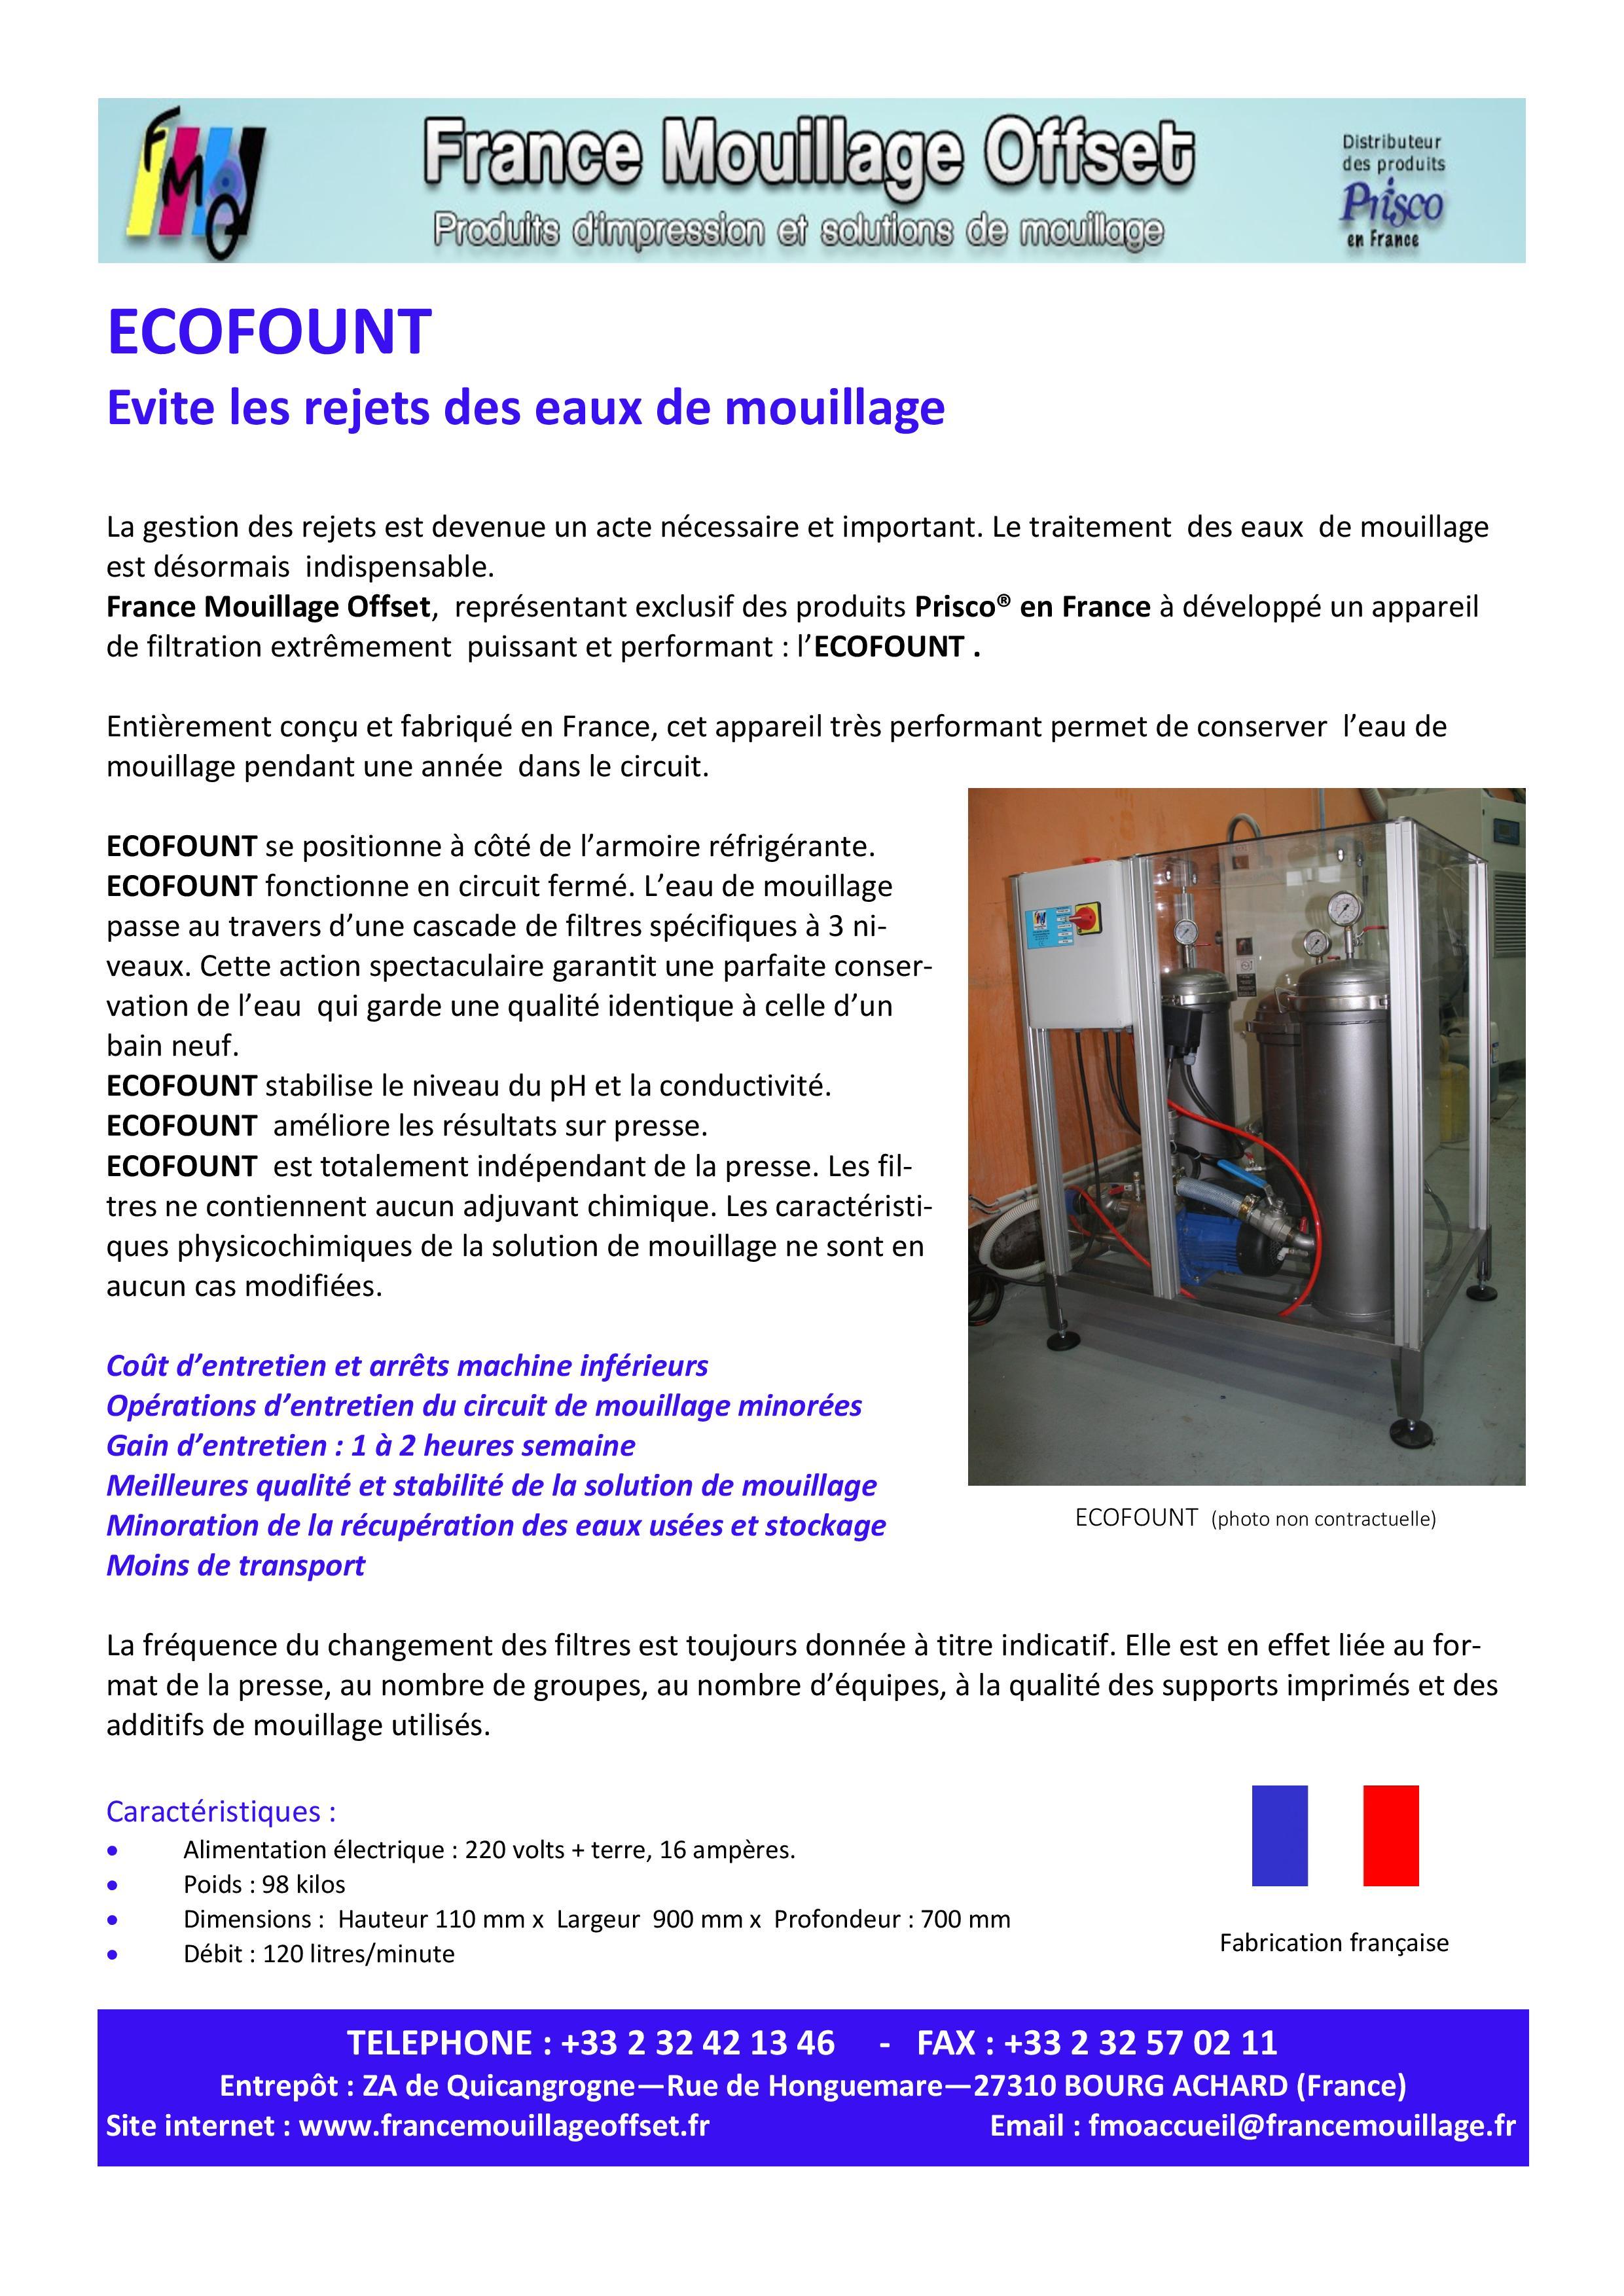 ECOFOUNT FICHE TECHNIQUE INTERNET 082013-page-001